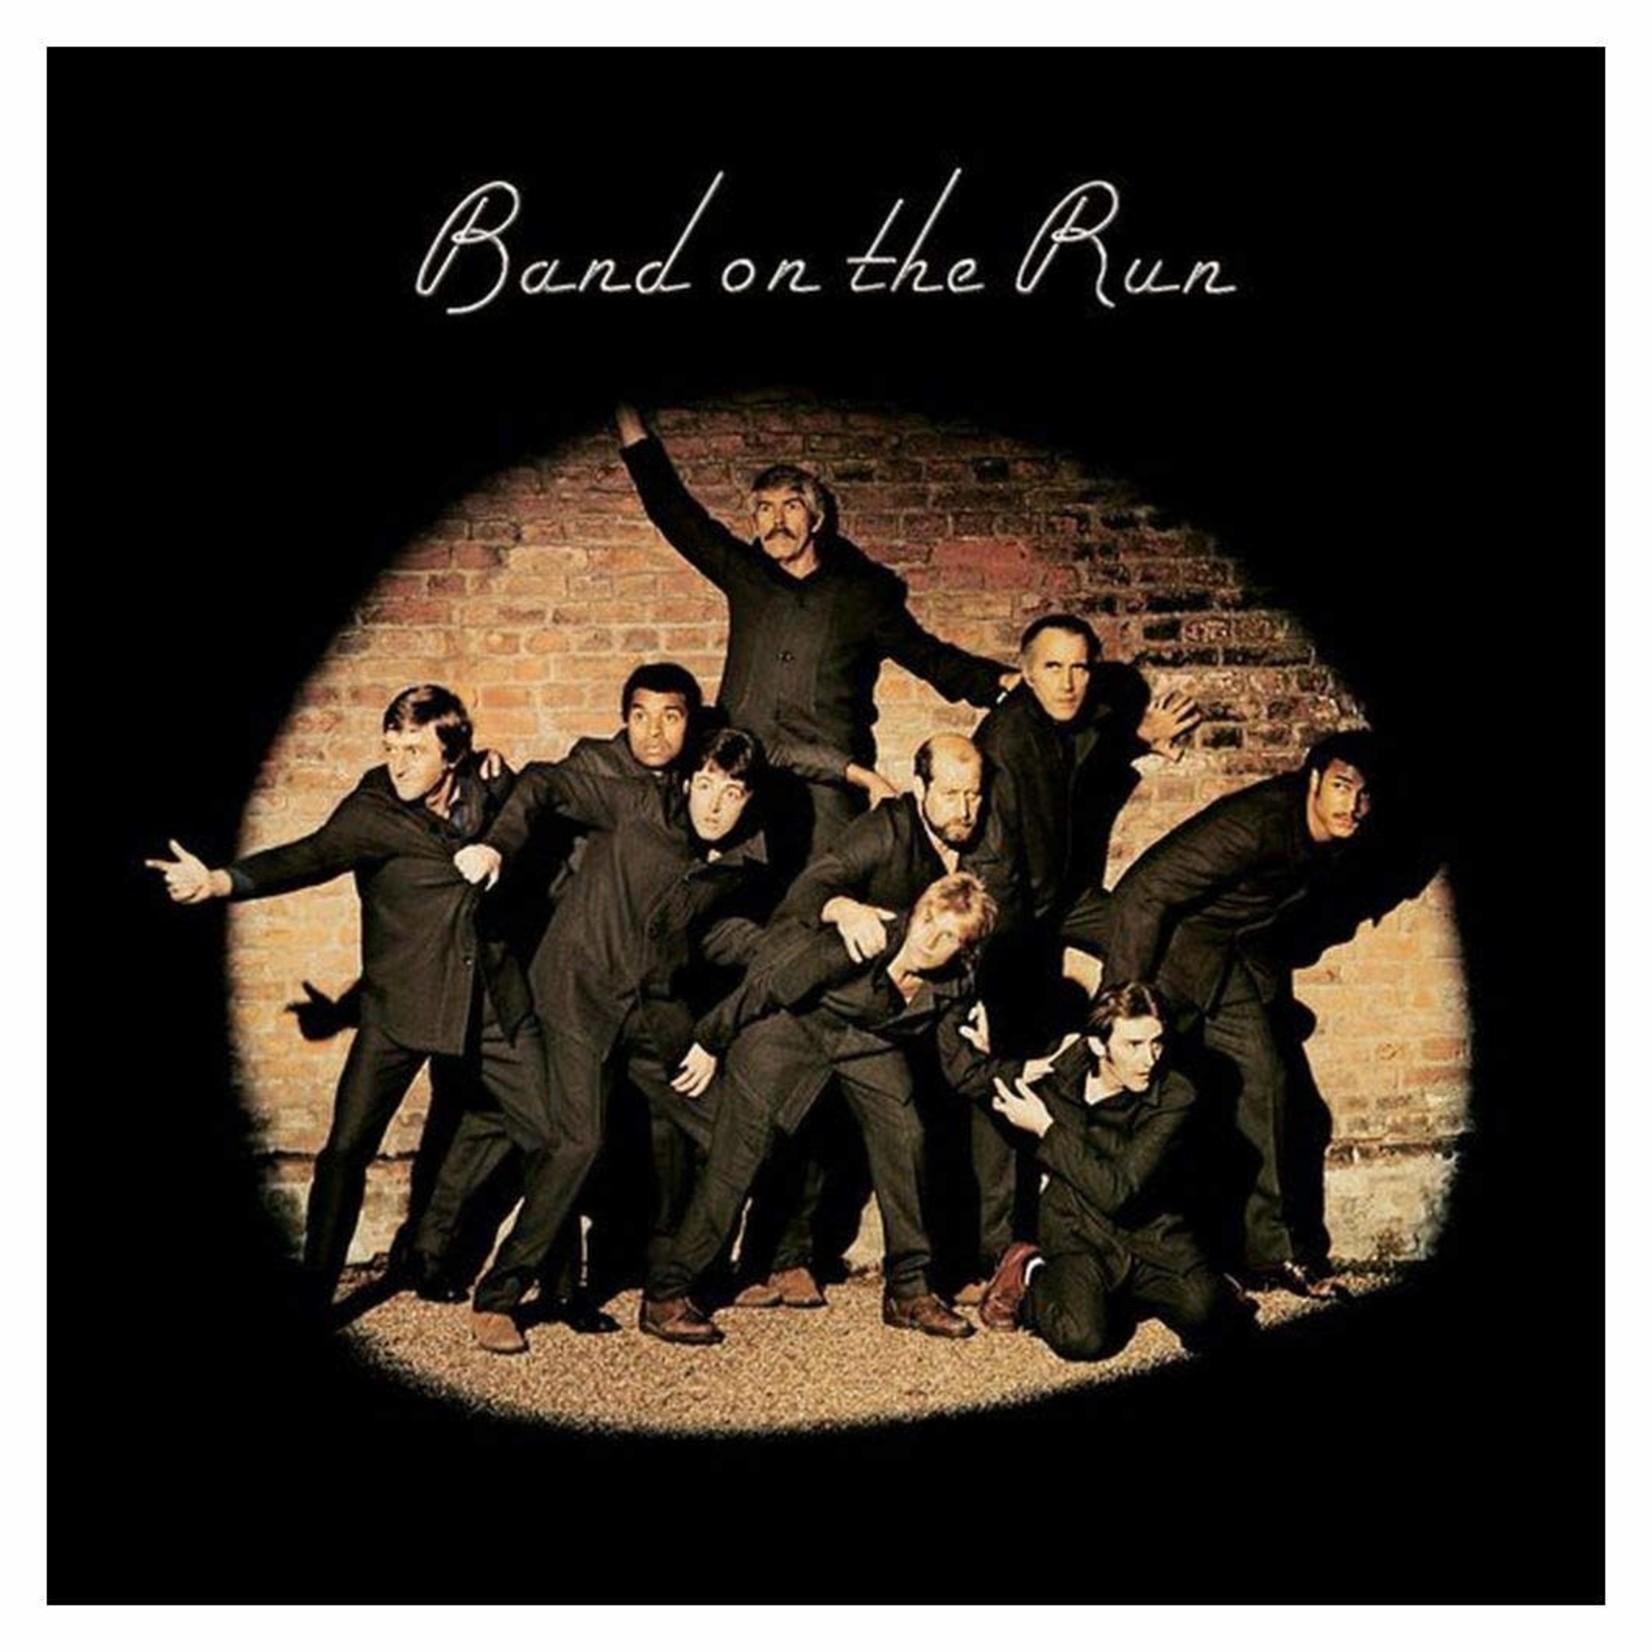 [Vintage] McCartney, Paul & Wings (Beatles): Band on the Run